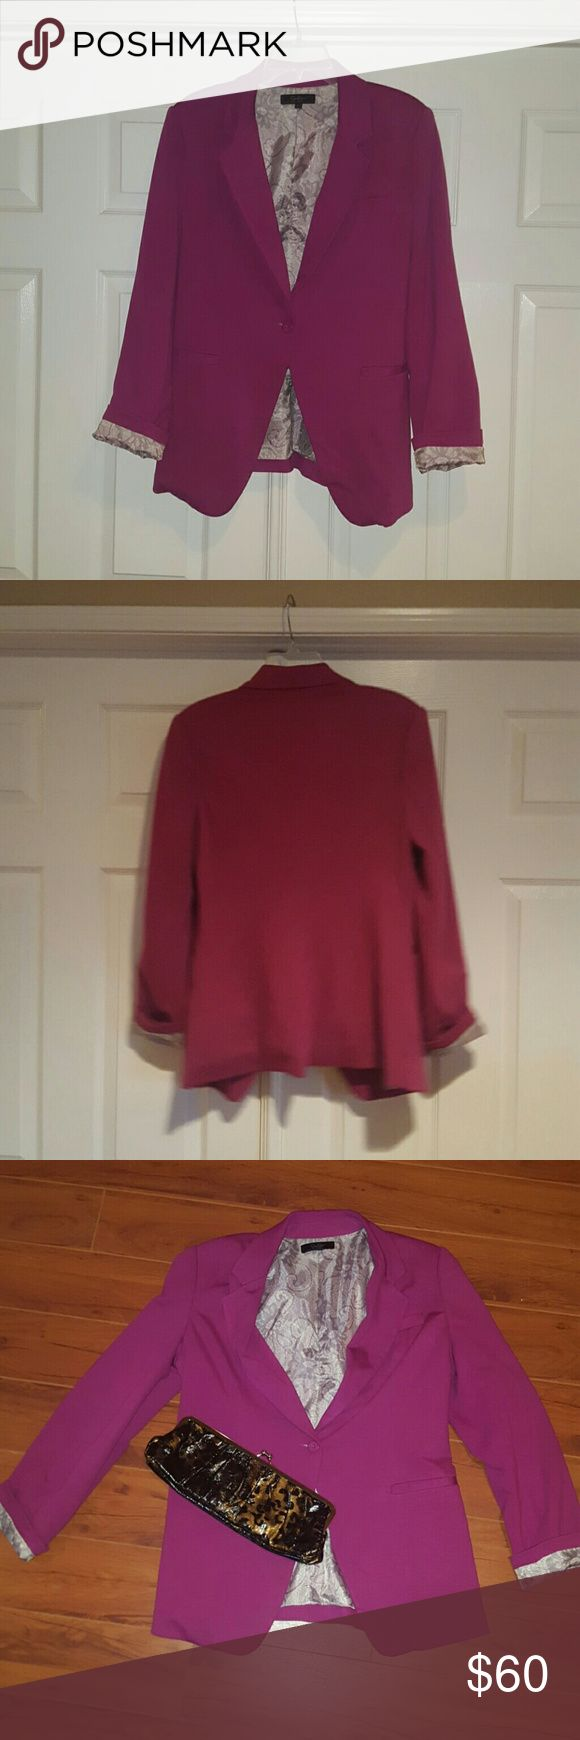 Jessica Simpson Pink Blazer!!! Cute Pink Blazer!!! Dress it up or down! Jessica Simpson Jackets & Coats Blazers